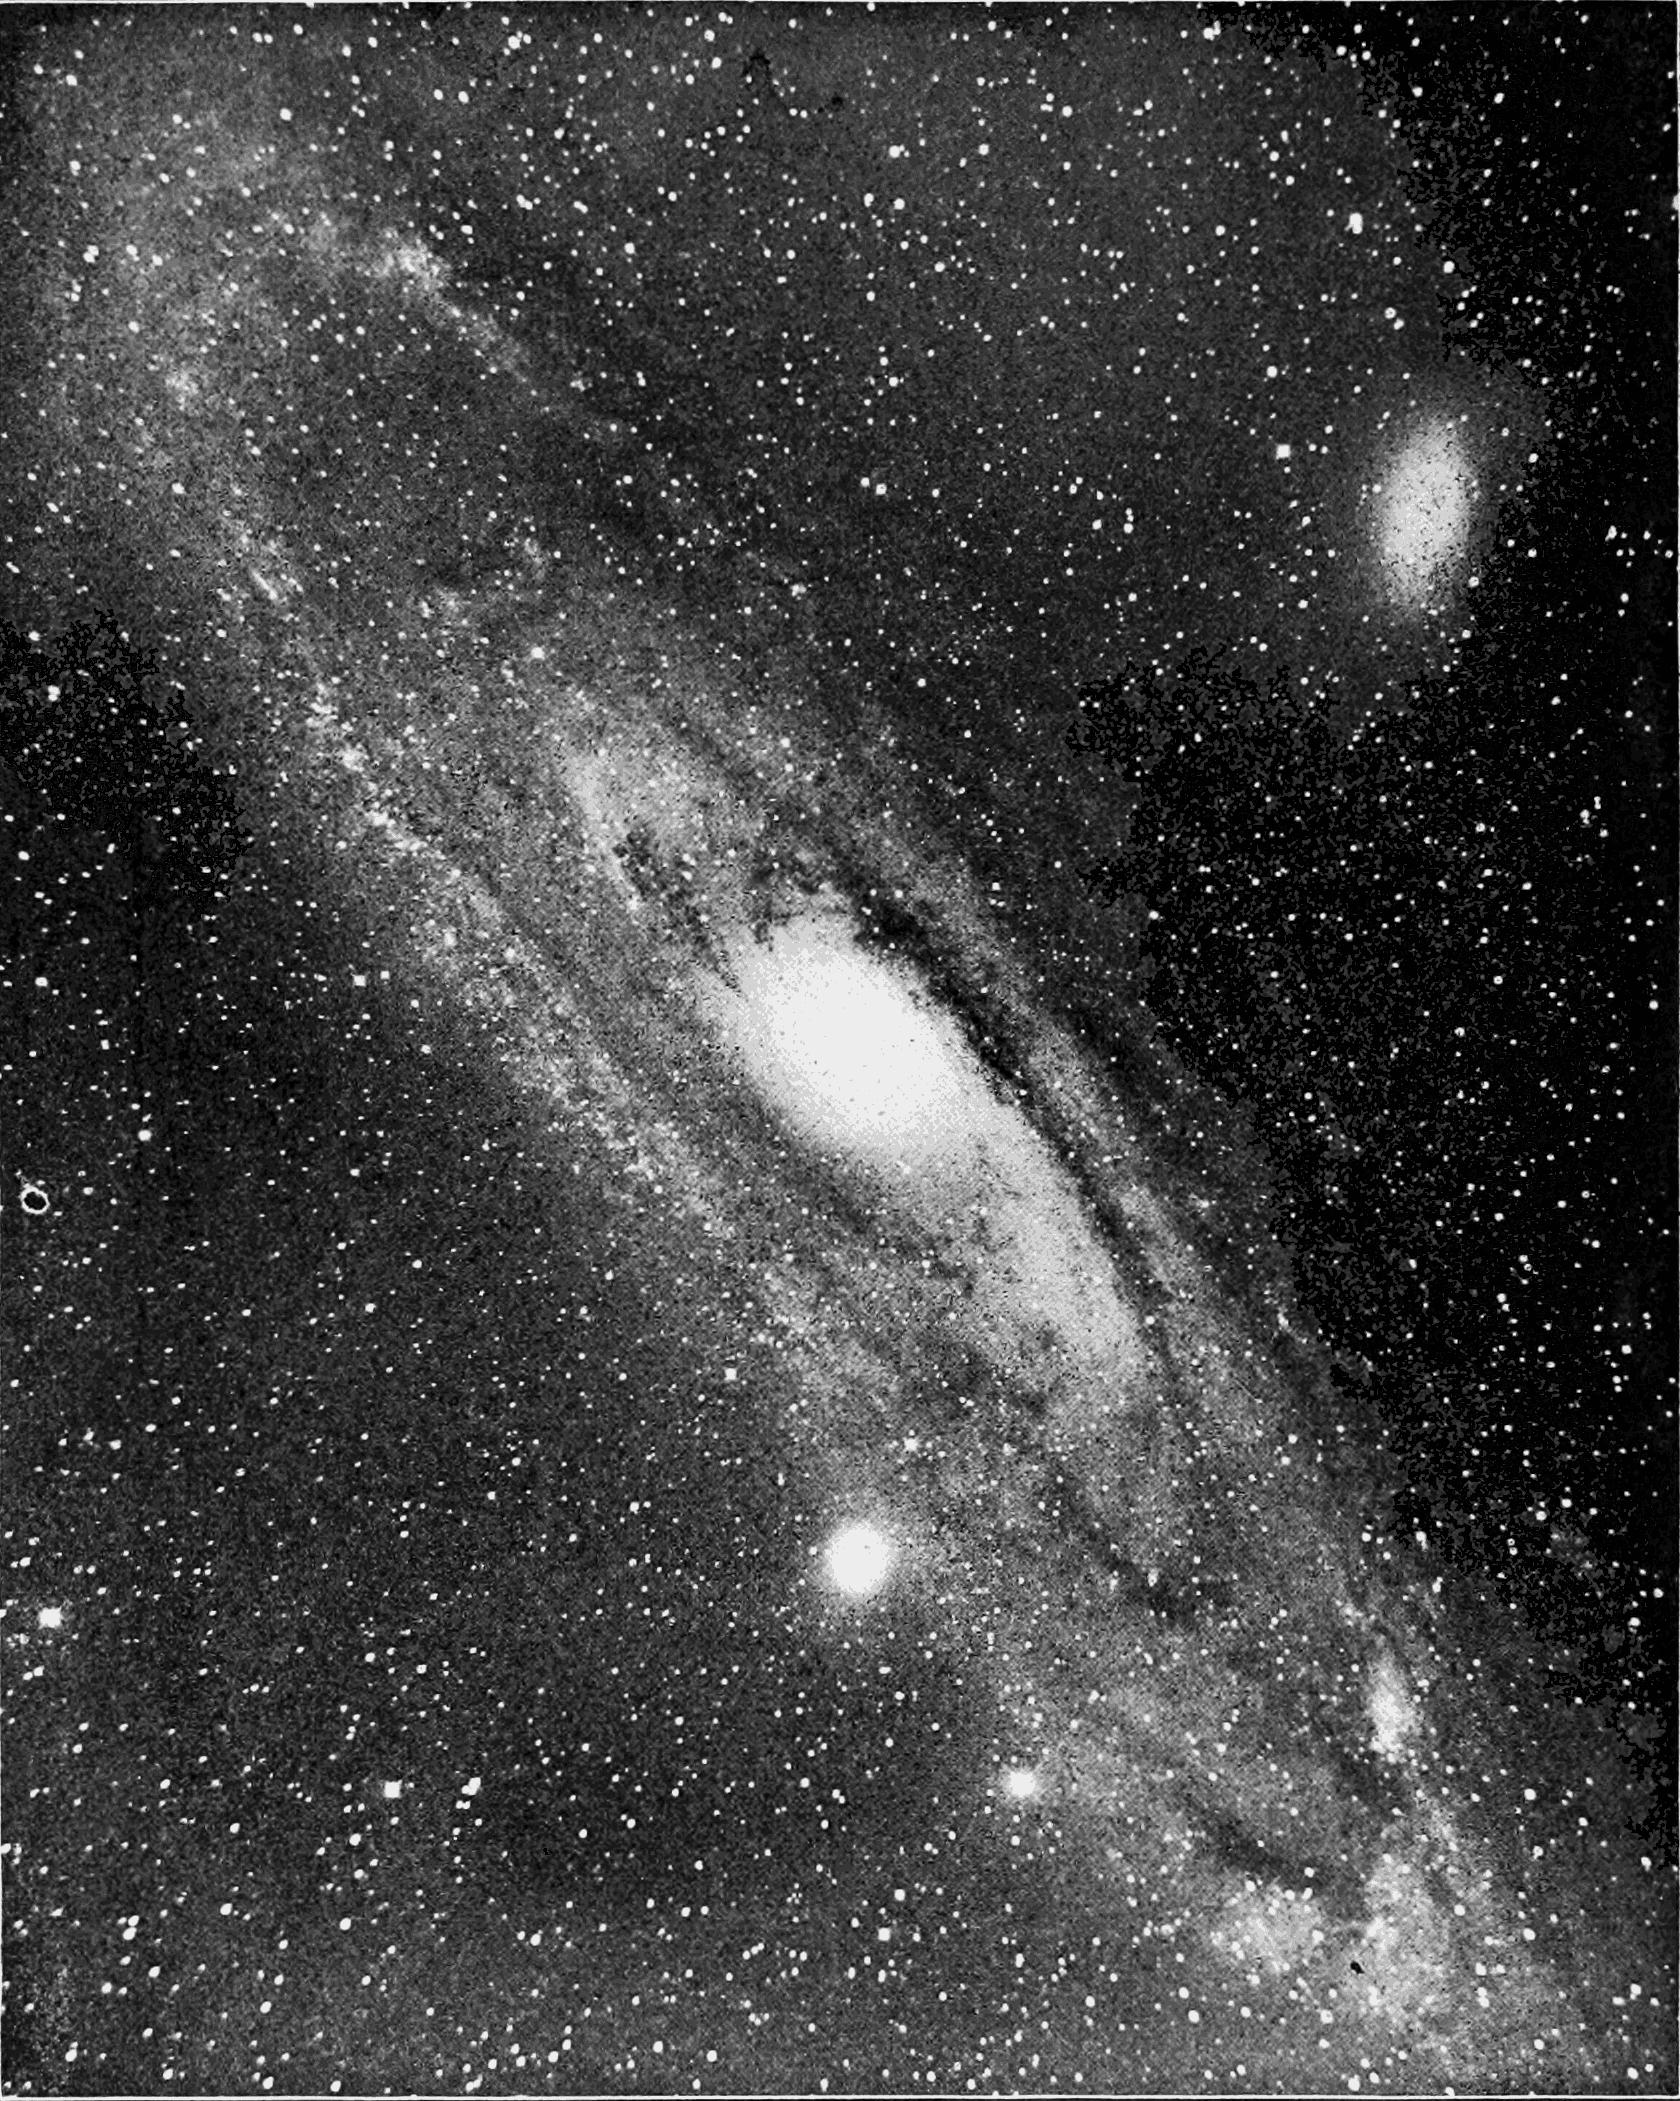 File:PSM V60 D298 Great nebula in andromeda.png.